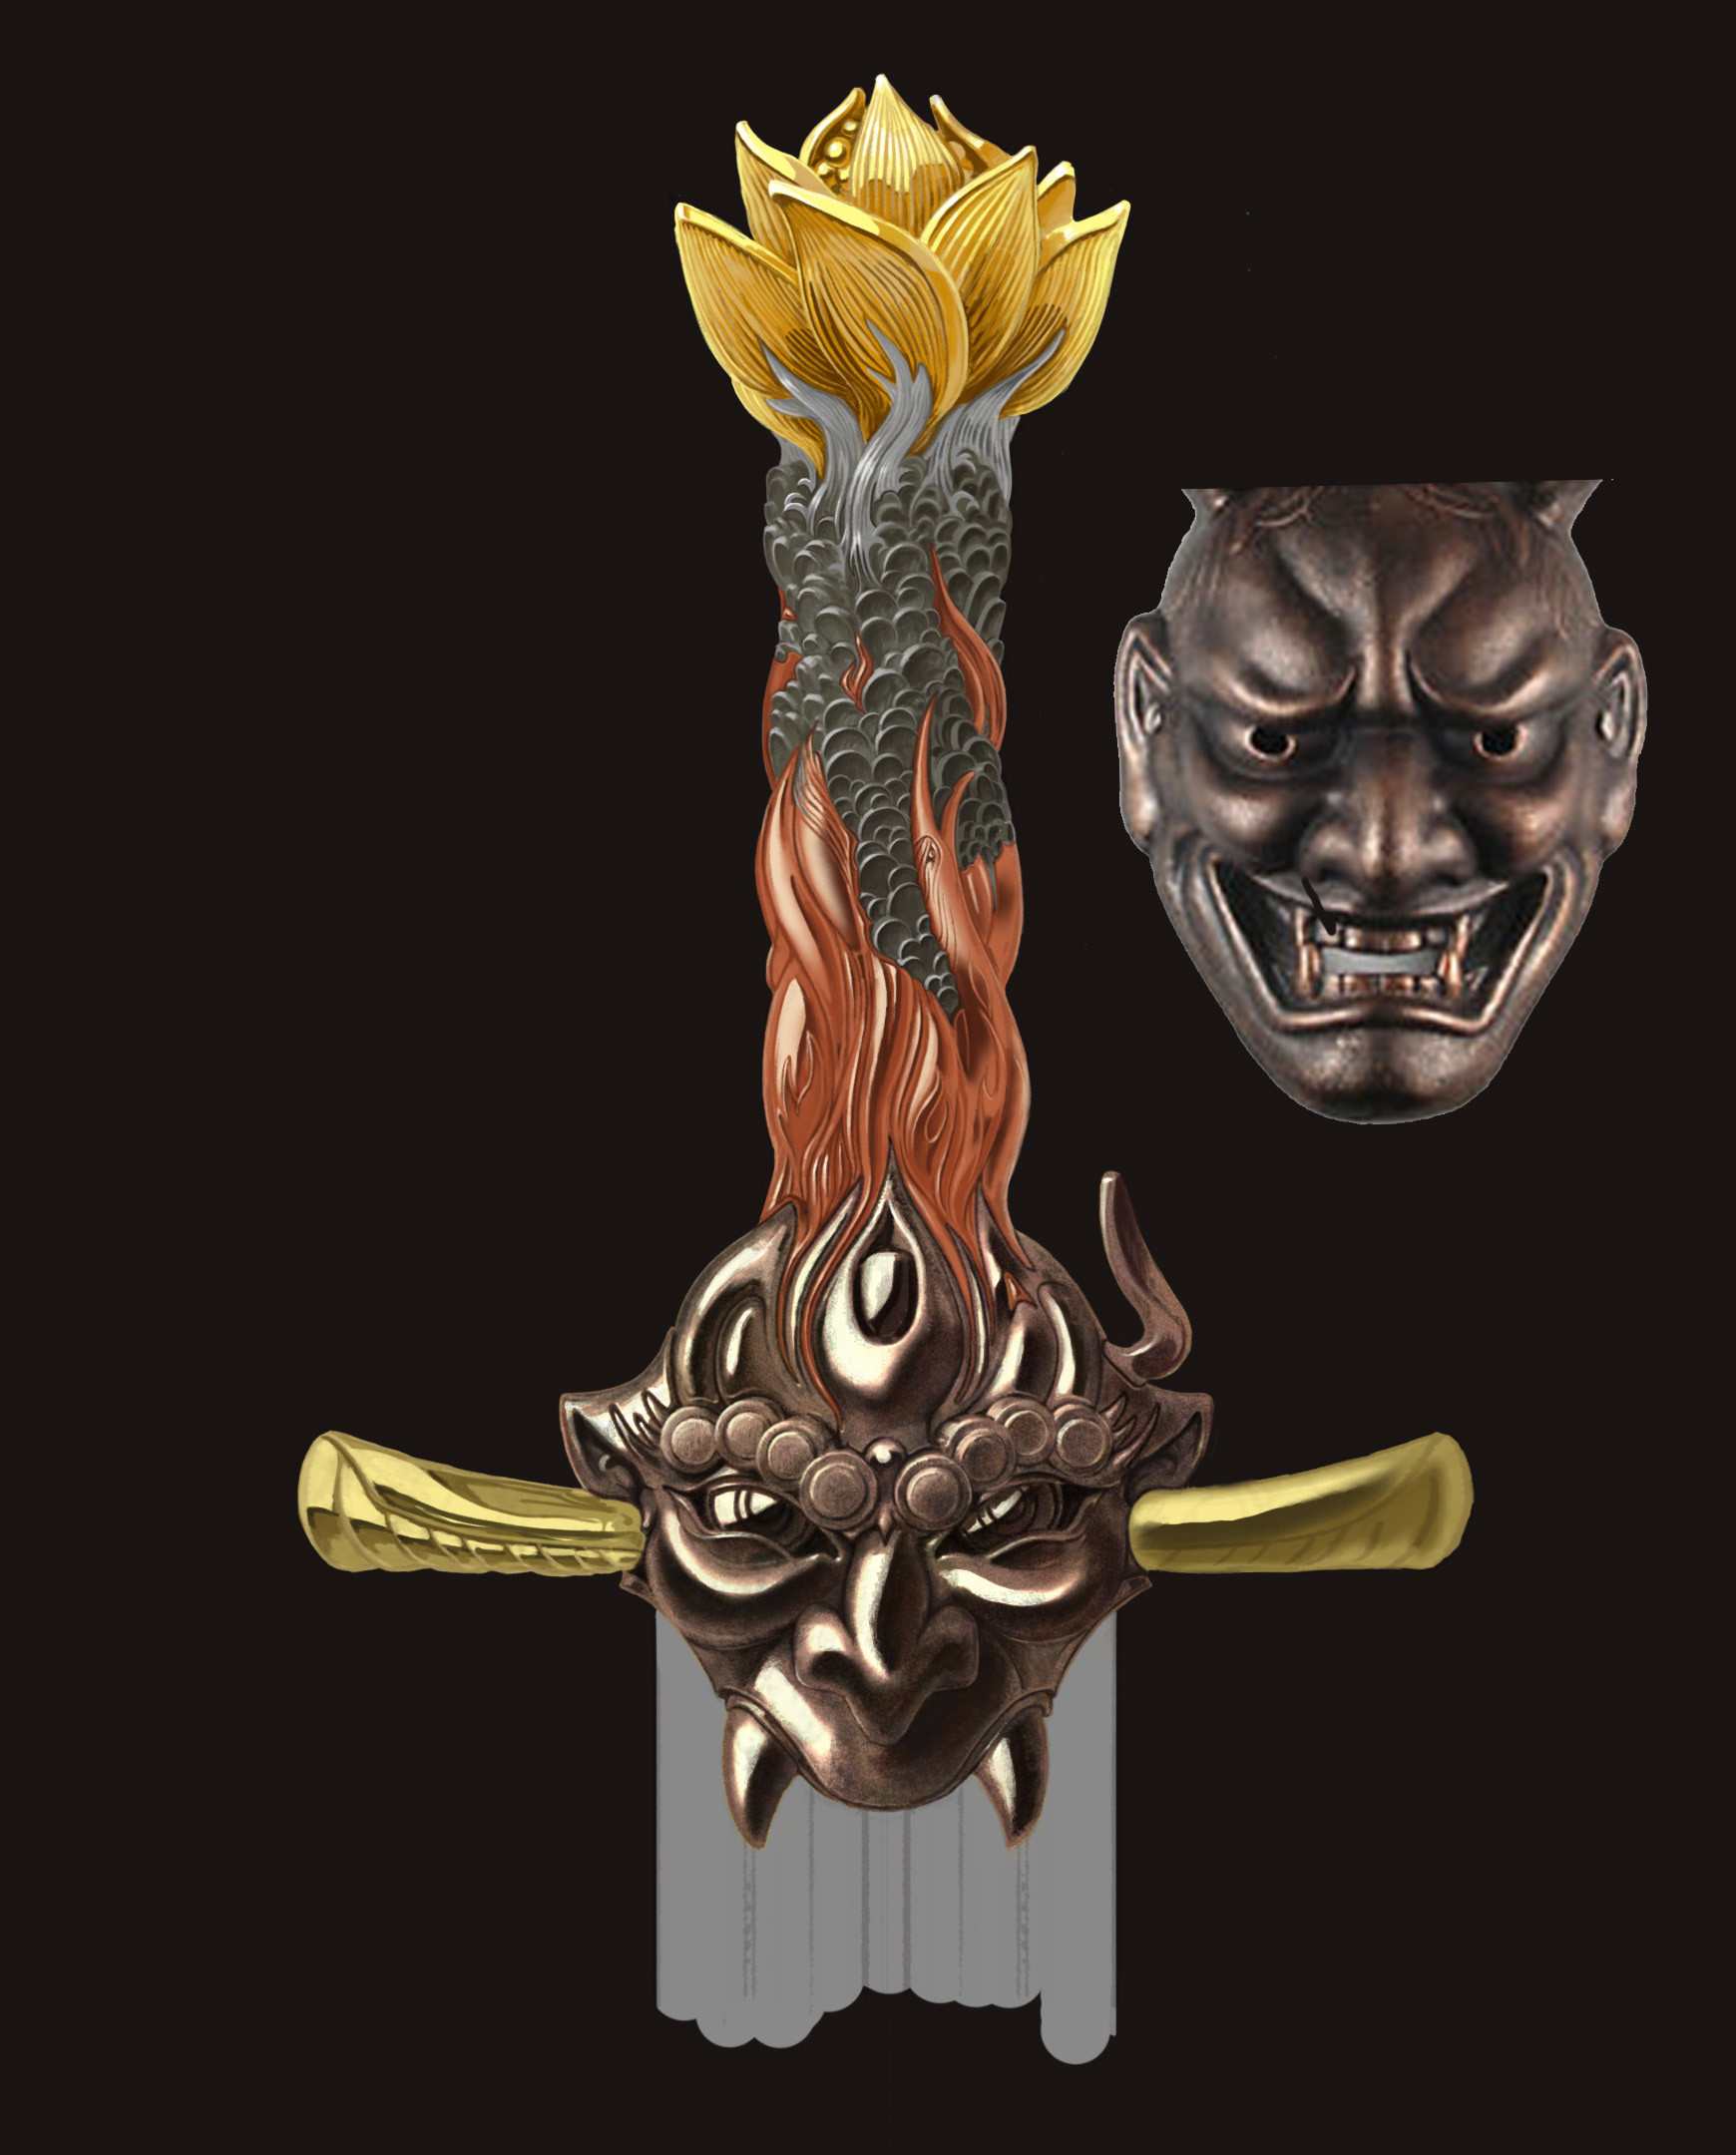 Jeff zugale sword hilt design 02 color wip2